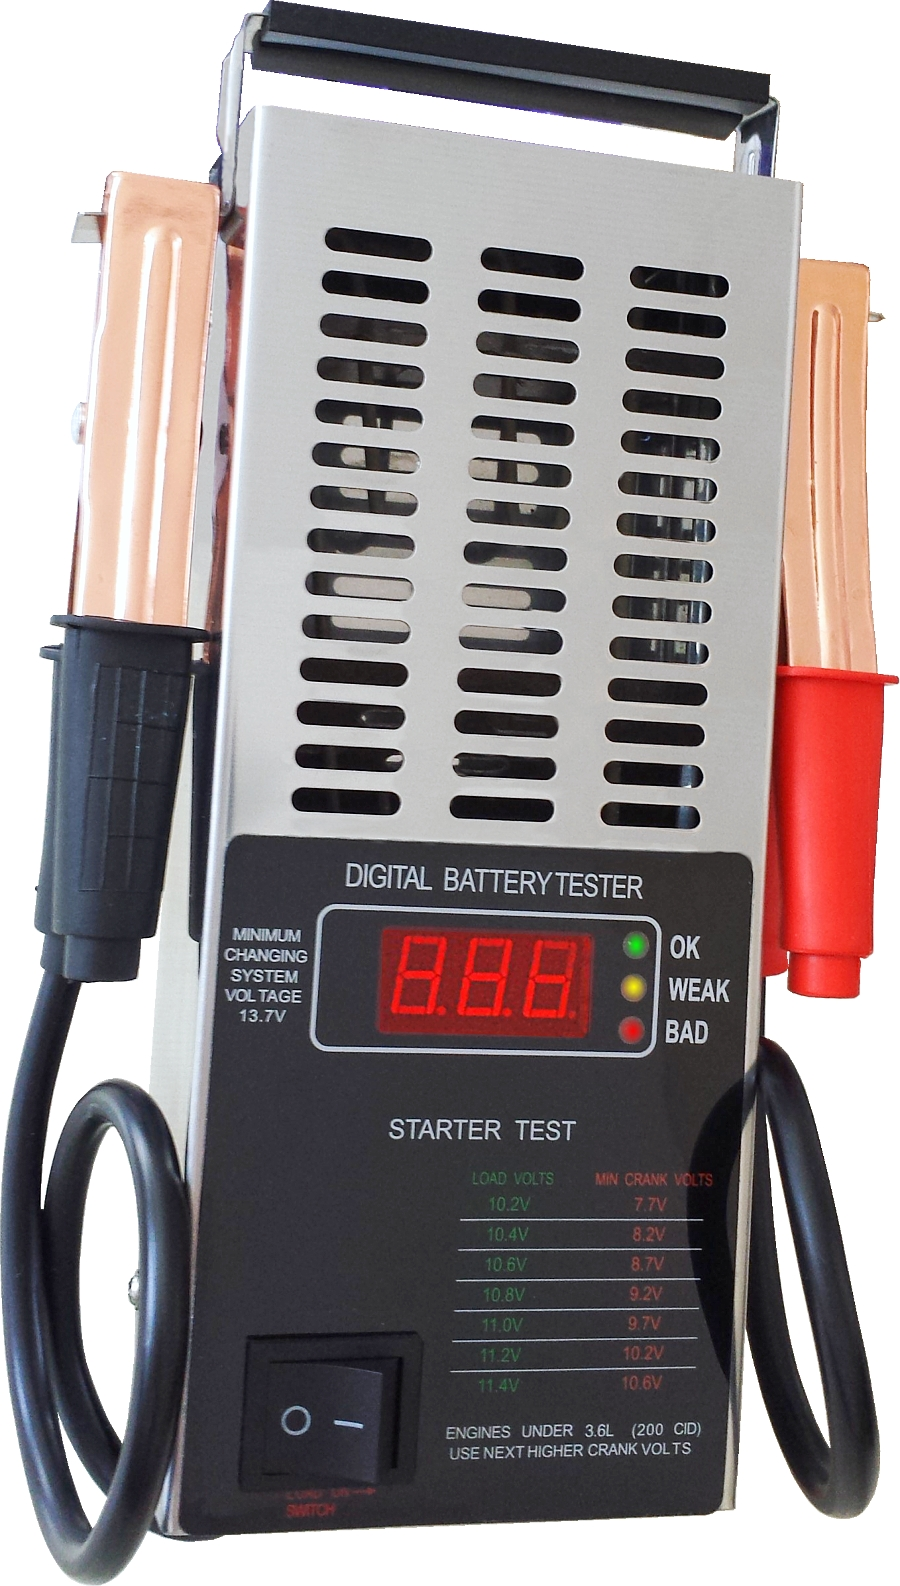 Digitaler Batterie-Tester Testgerät Lichtmaschine Ladesystem 12V Autobatterie